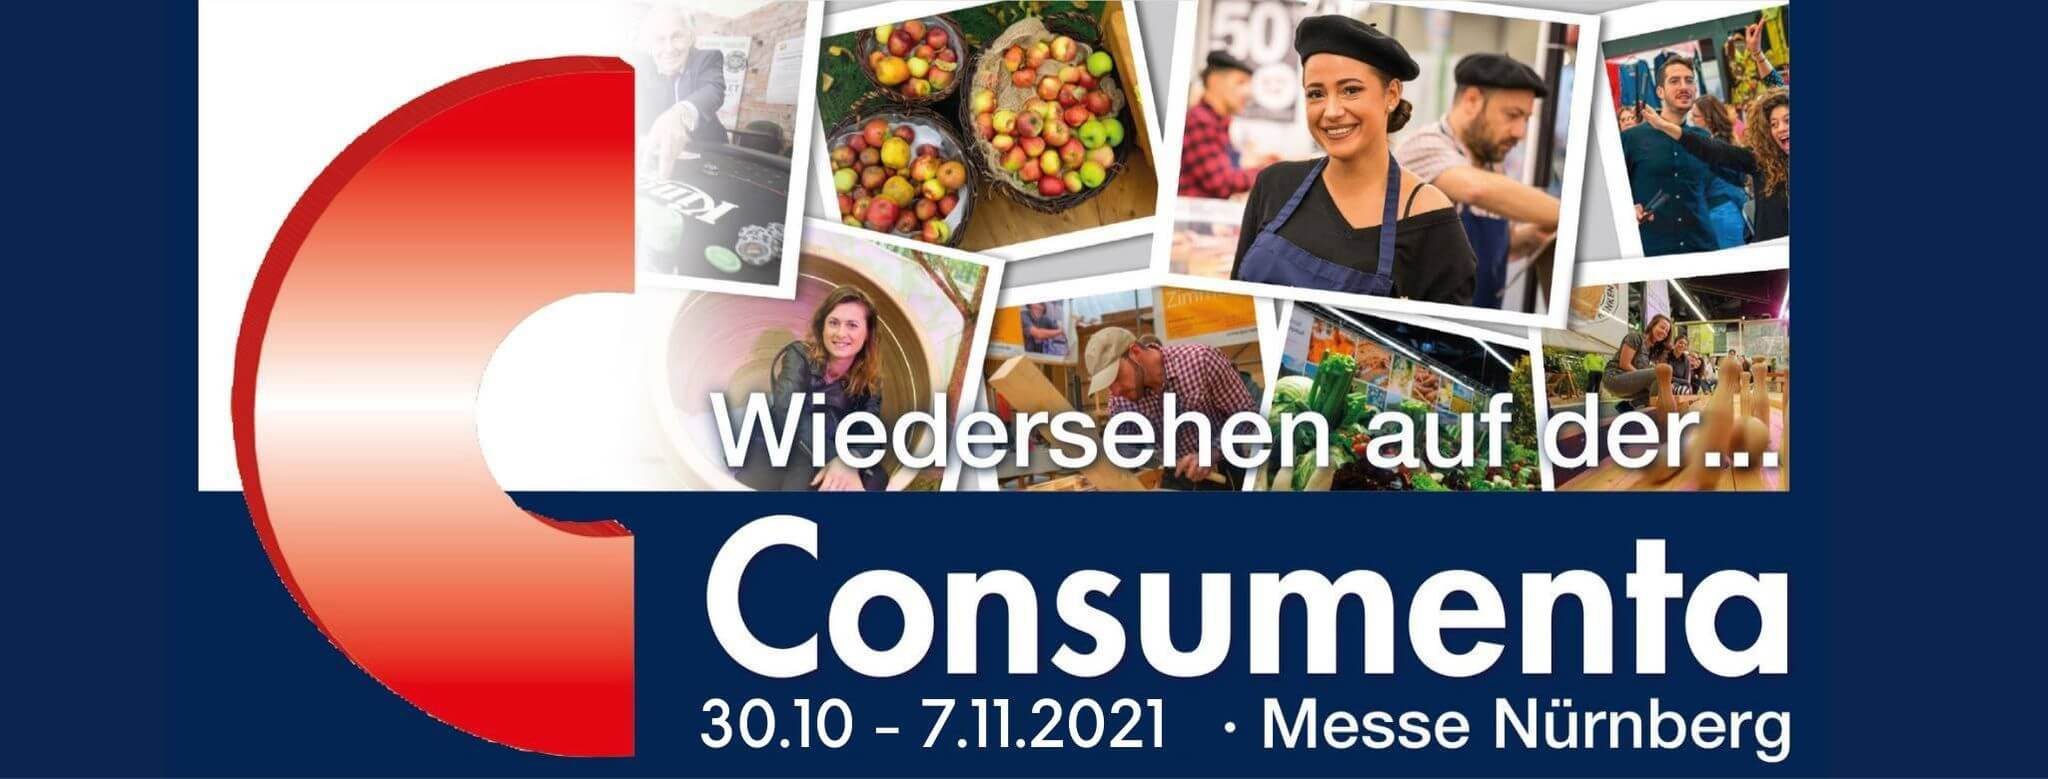 Consumenta 2021 - 30.10.2021 bis 7.11.2021 - Messe Nürnberg